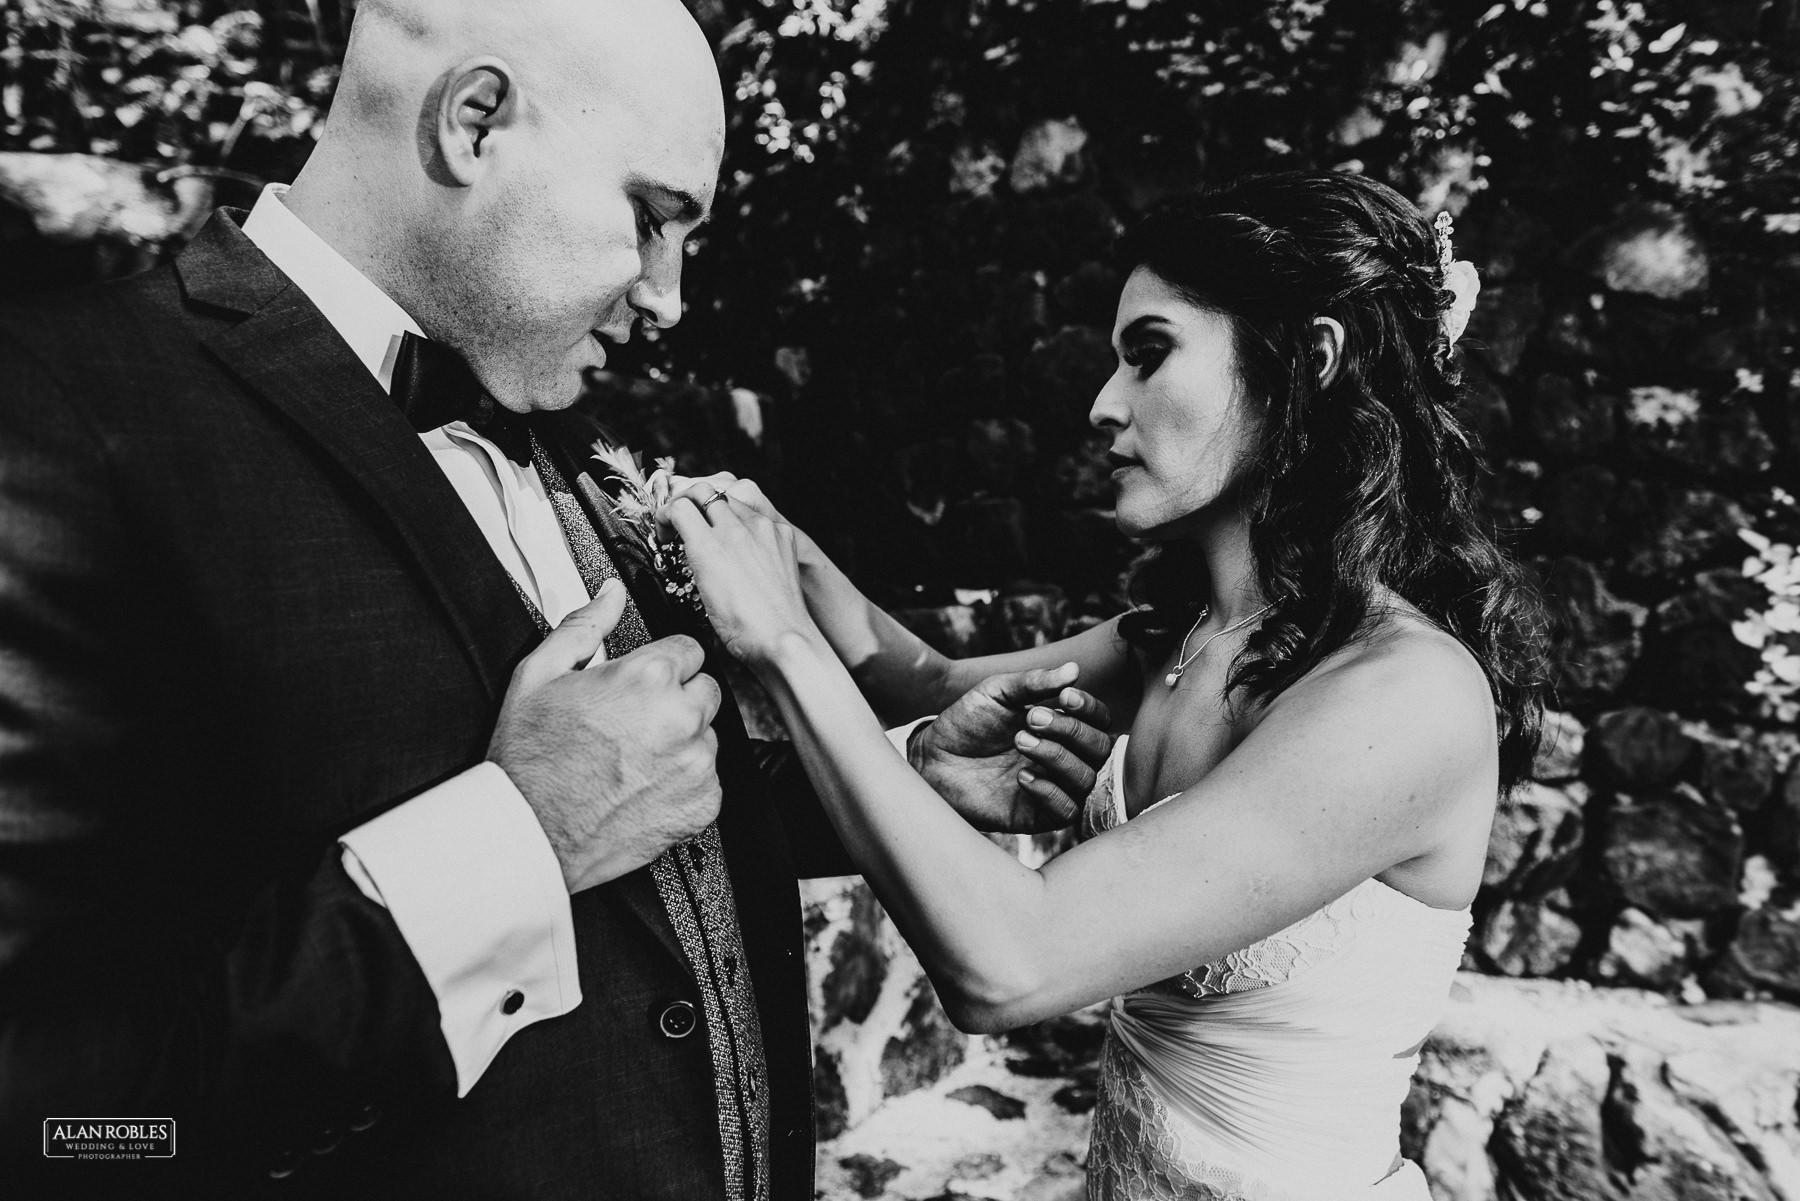 Fotografo de bodas guadalajara Alan Robles - Pinare terraza bistro 17